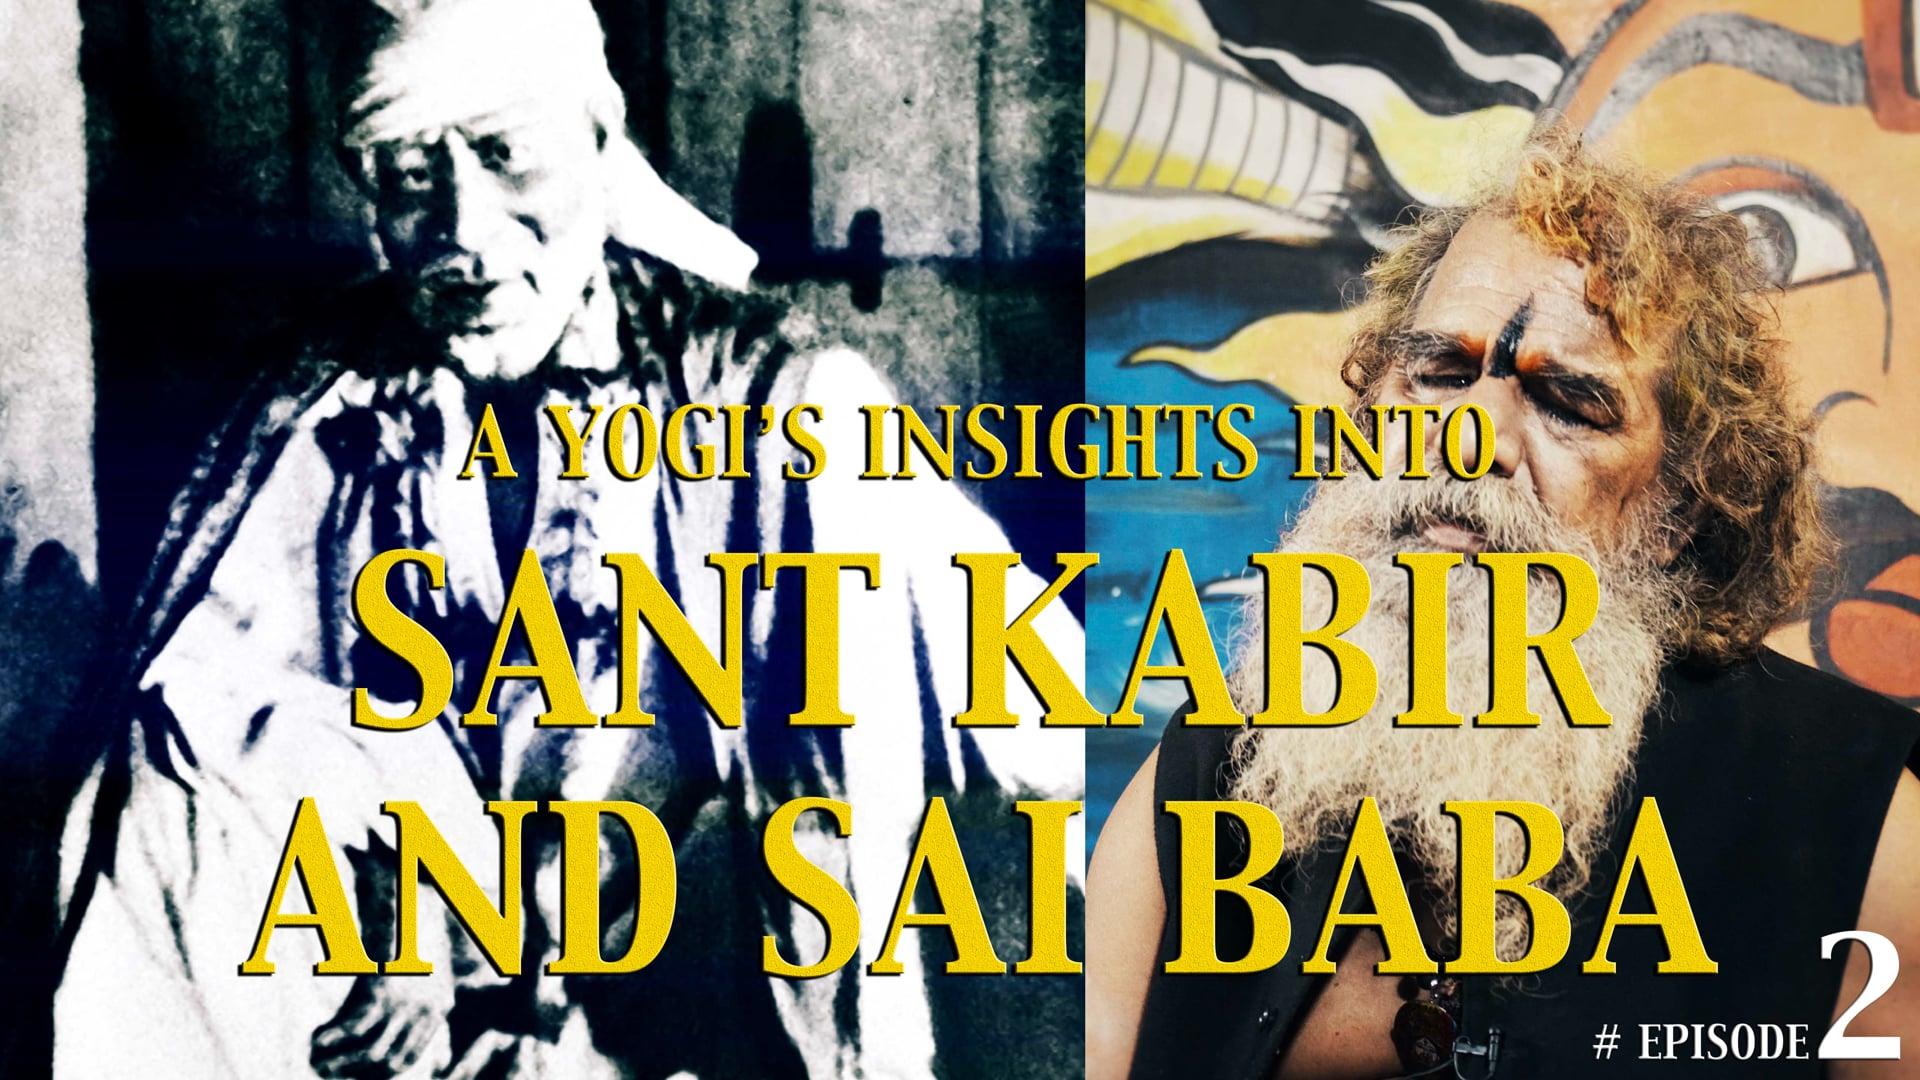 The Teachings of Sai Baba and Kabir